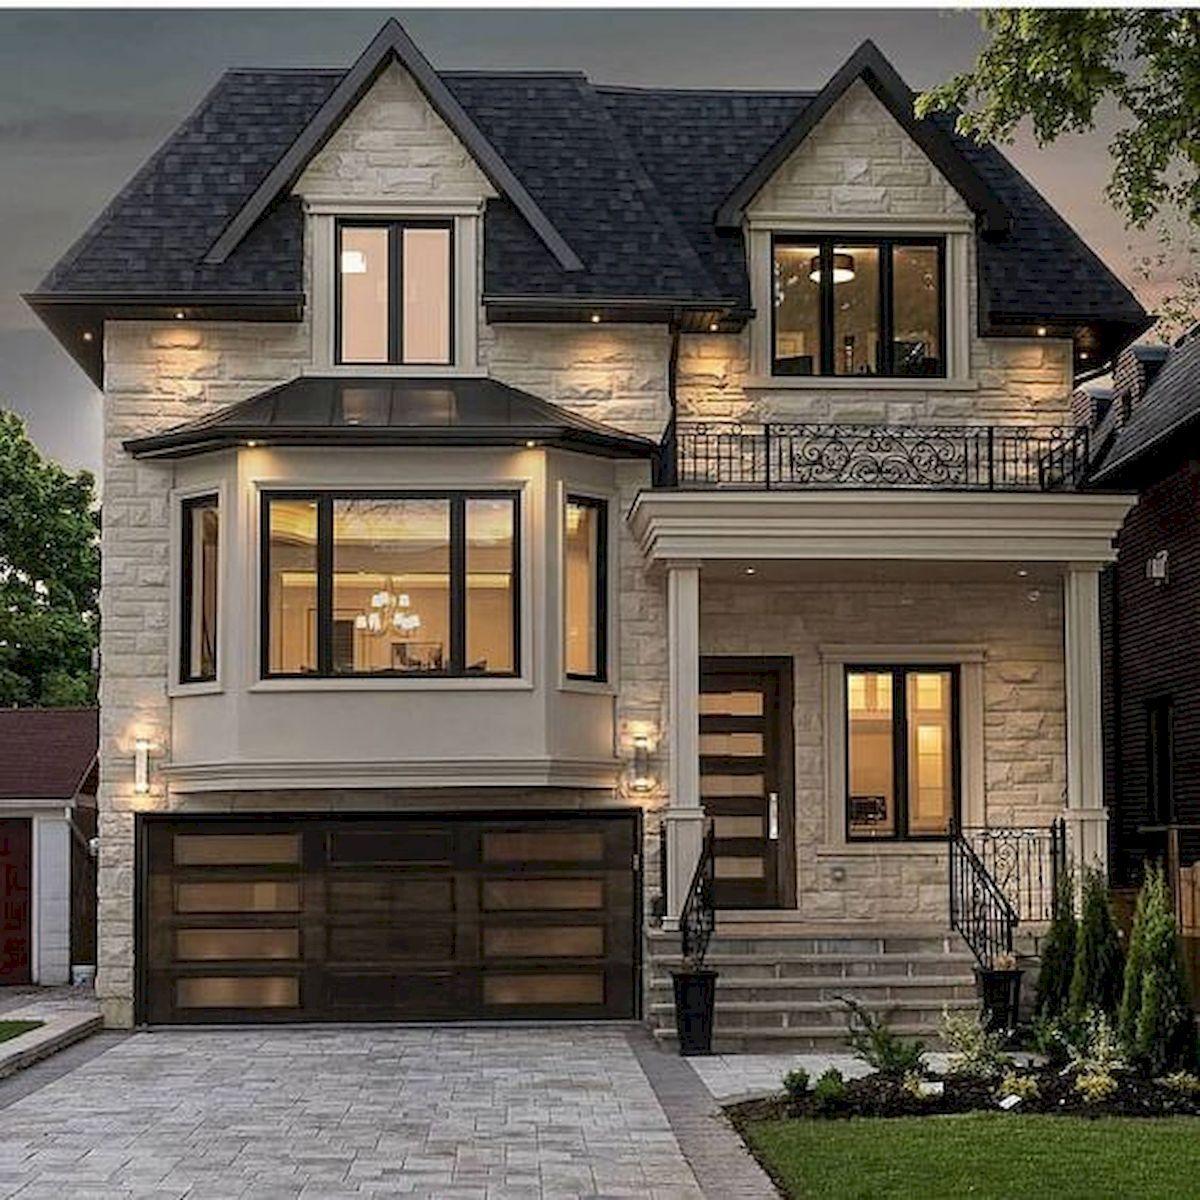 16 Cozy Look Modern Dream House Exterior Design In 2020 Unique House Design House Styles House Designs Exterior